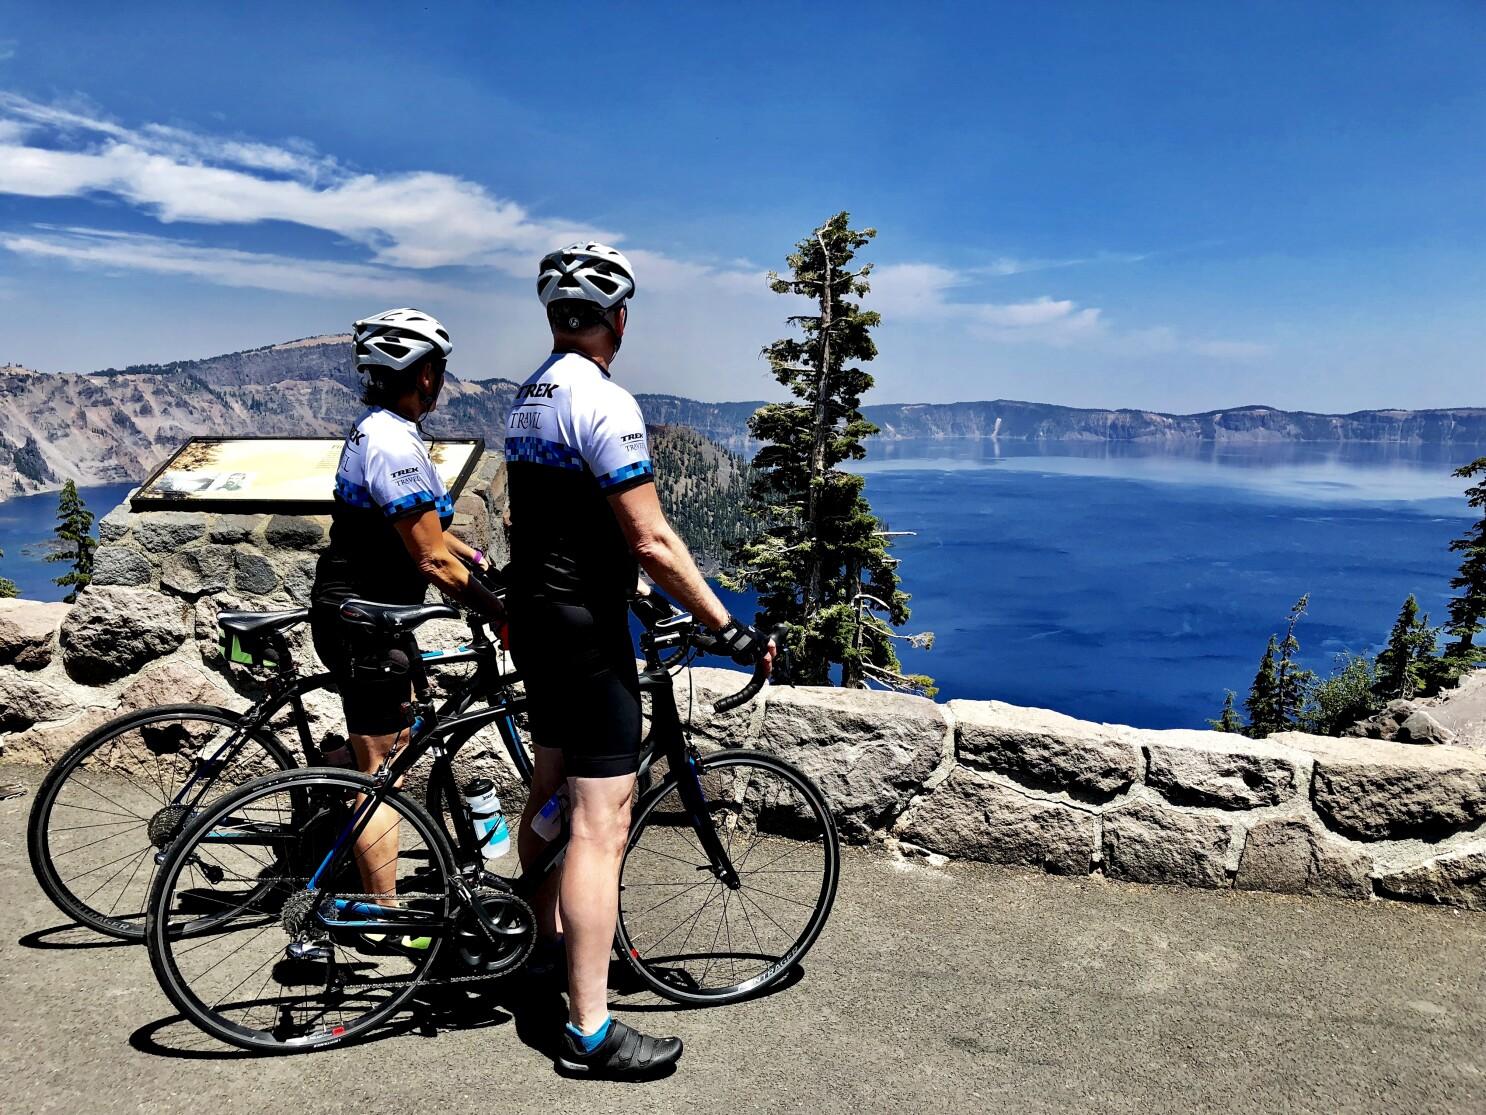 A little e-bike cheating makes Oregon Cascades bike tour a gem of a cycling trip